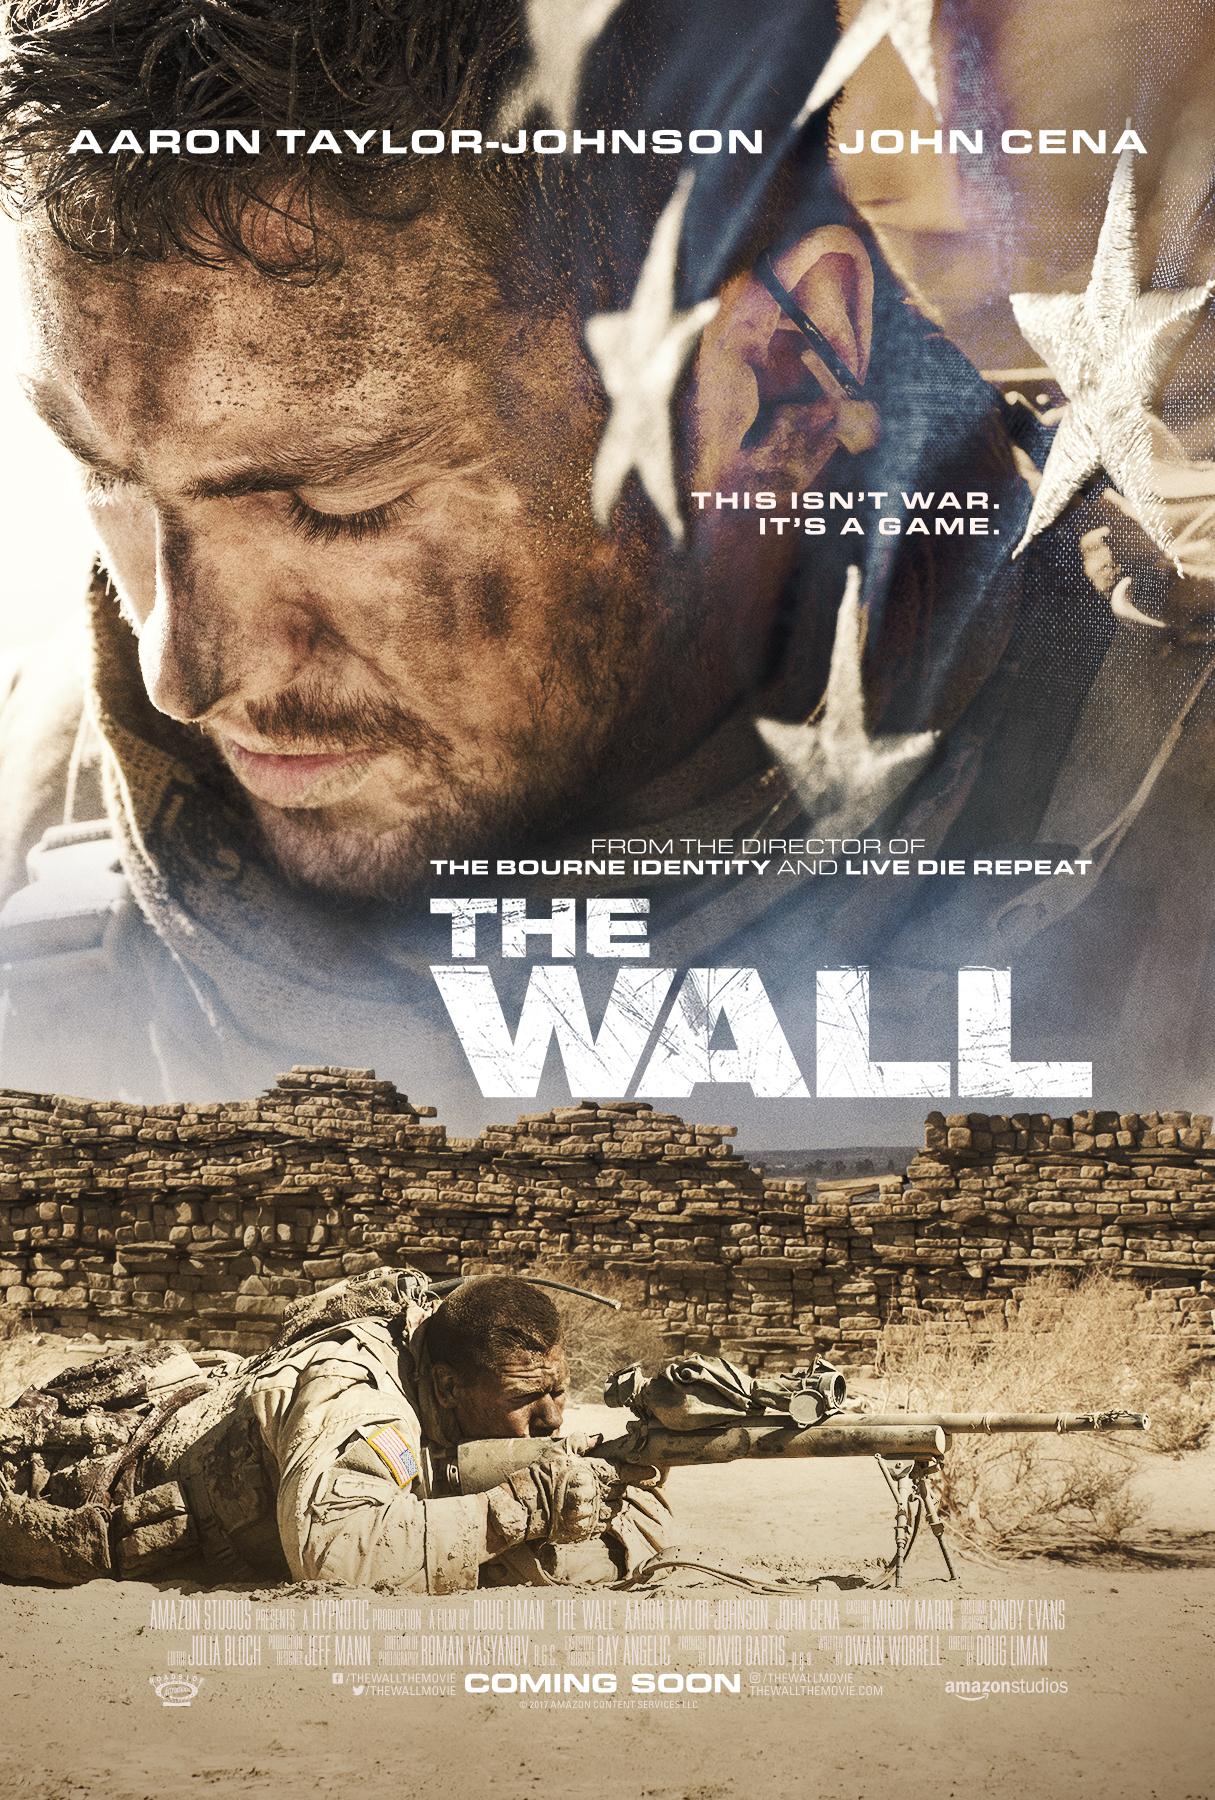 John Cena and Aaron Taylor-Johnson in The Wall (2017)